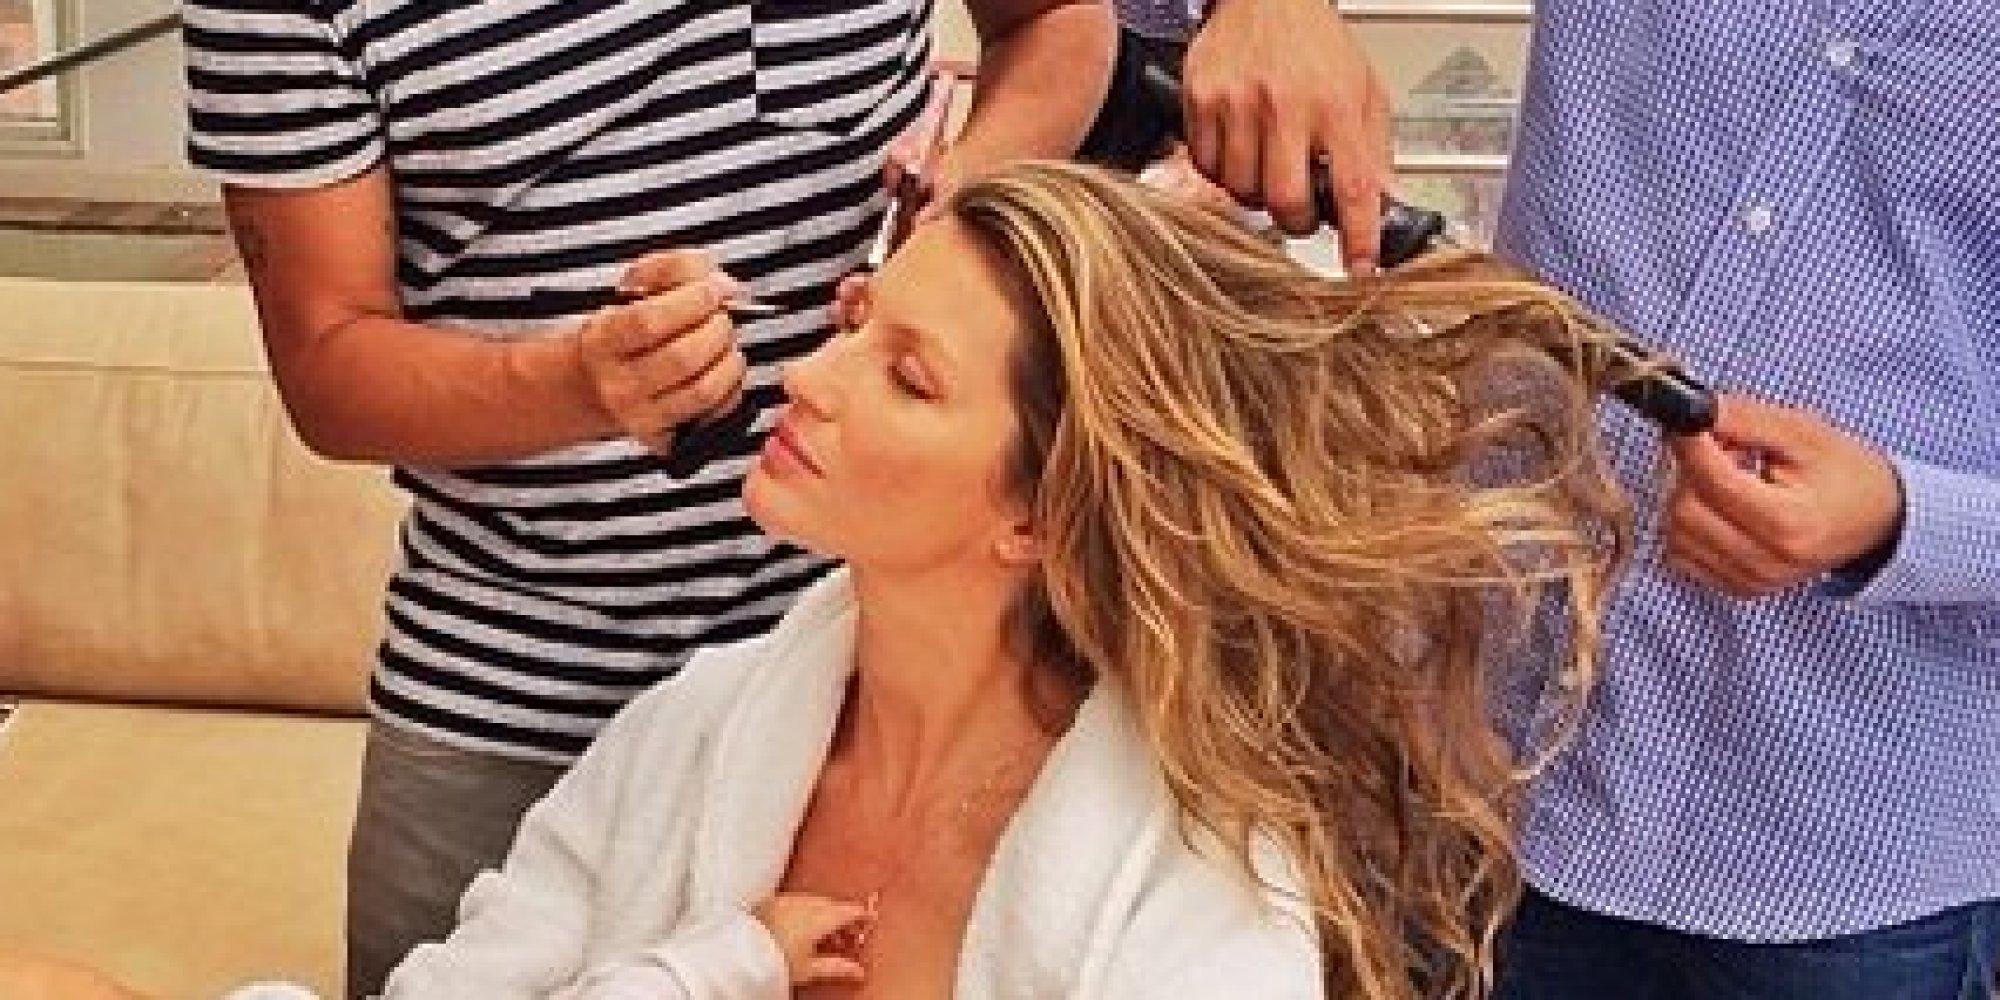 Model Gisele Bundchen Shows Her Support For Breastfeeding ... Gisele Bundchen Facebook